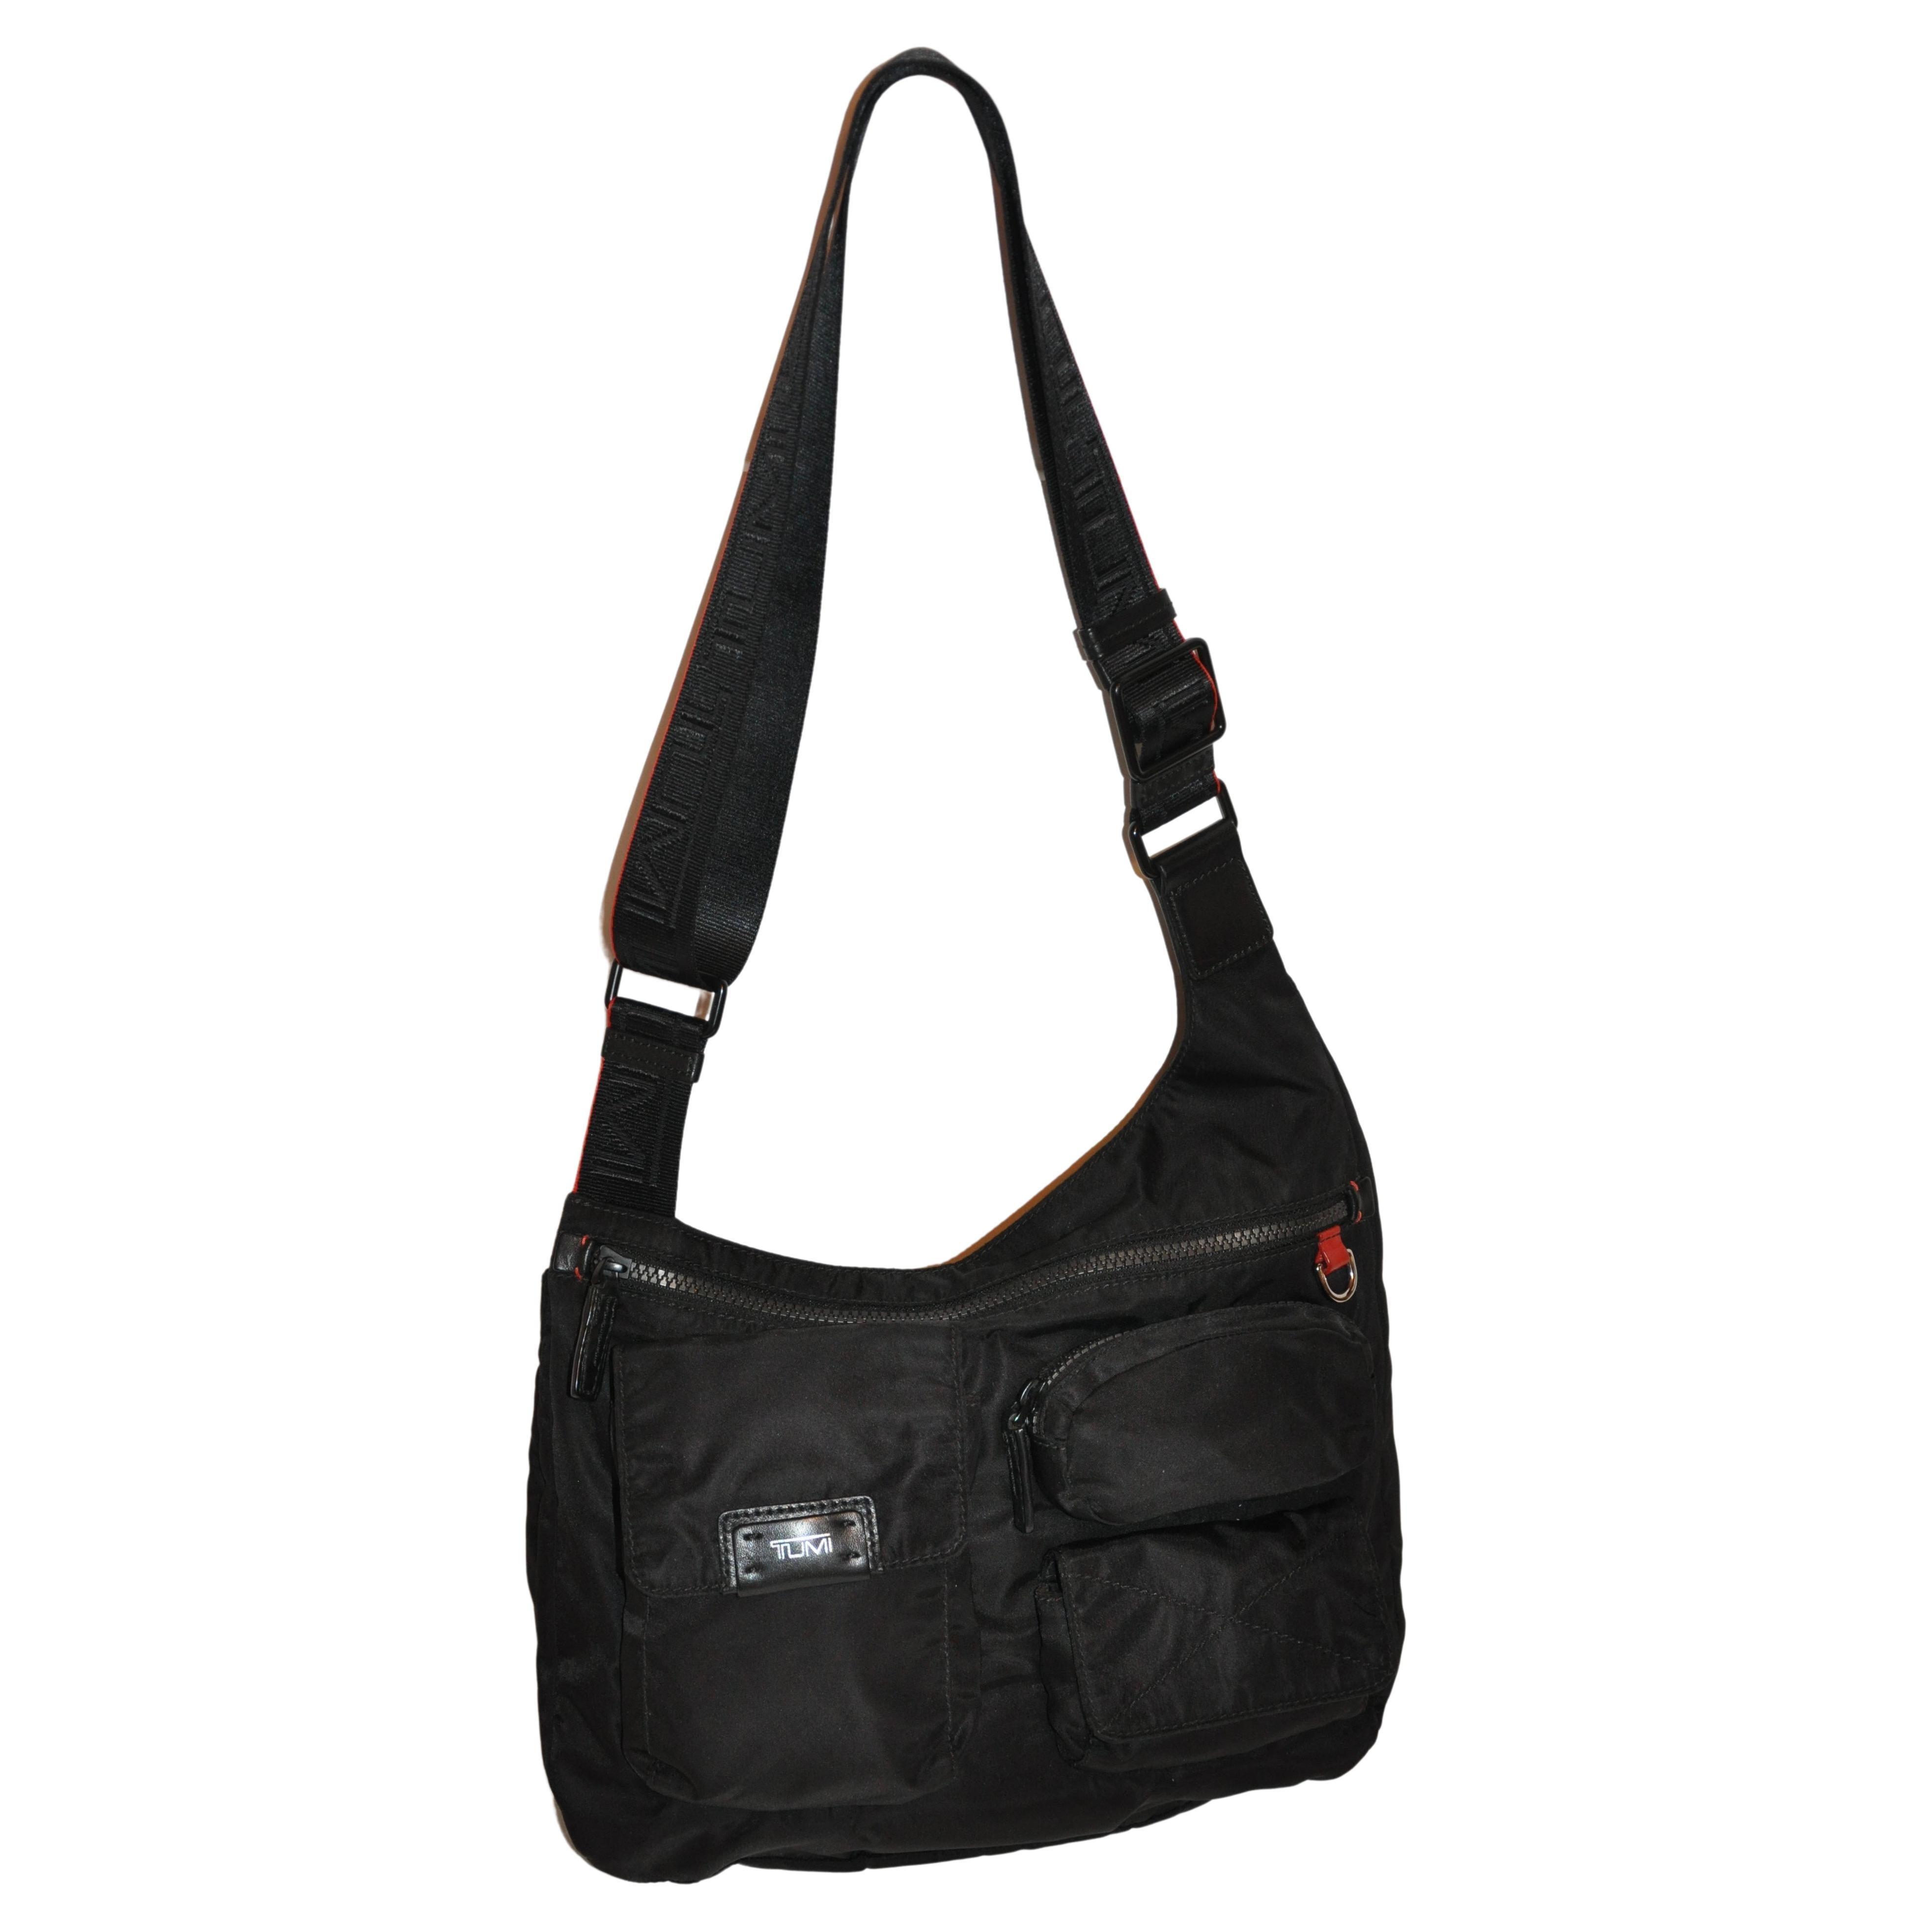 Tumi Zippered Top Crossbody Shoulder Bag with 4 Exterior Compartments